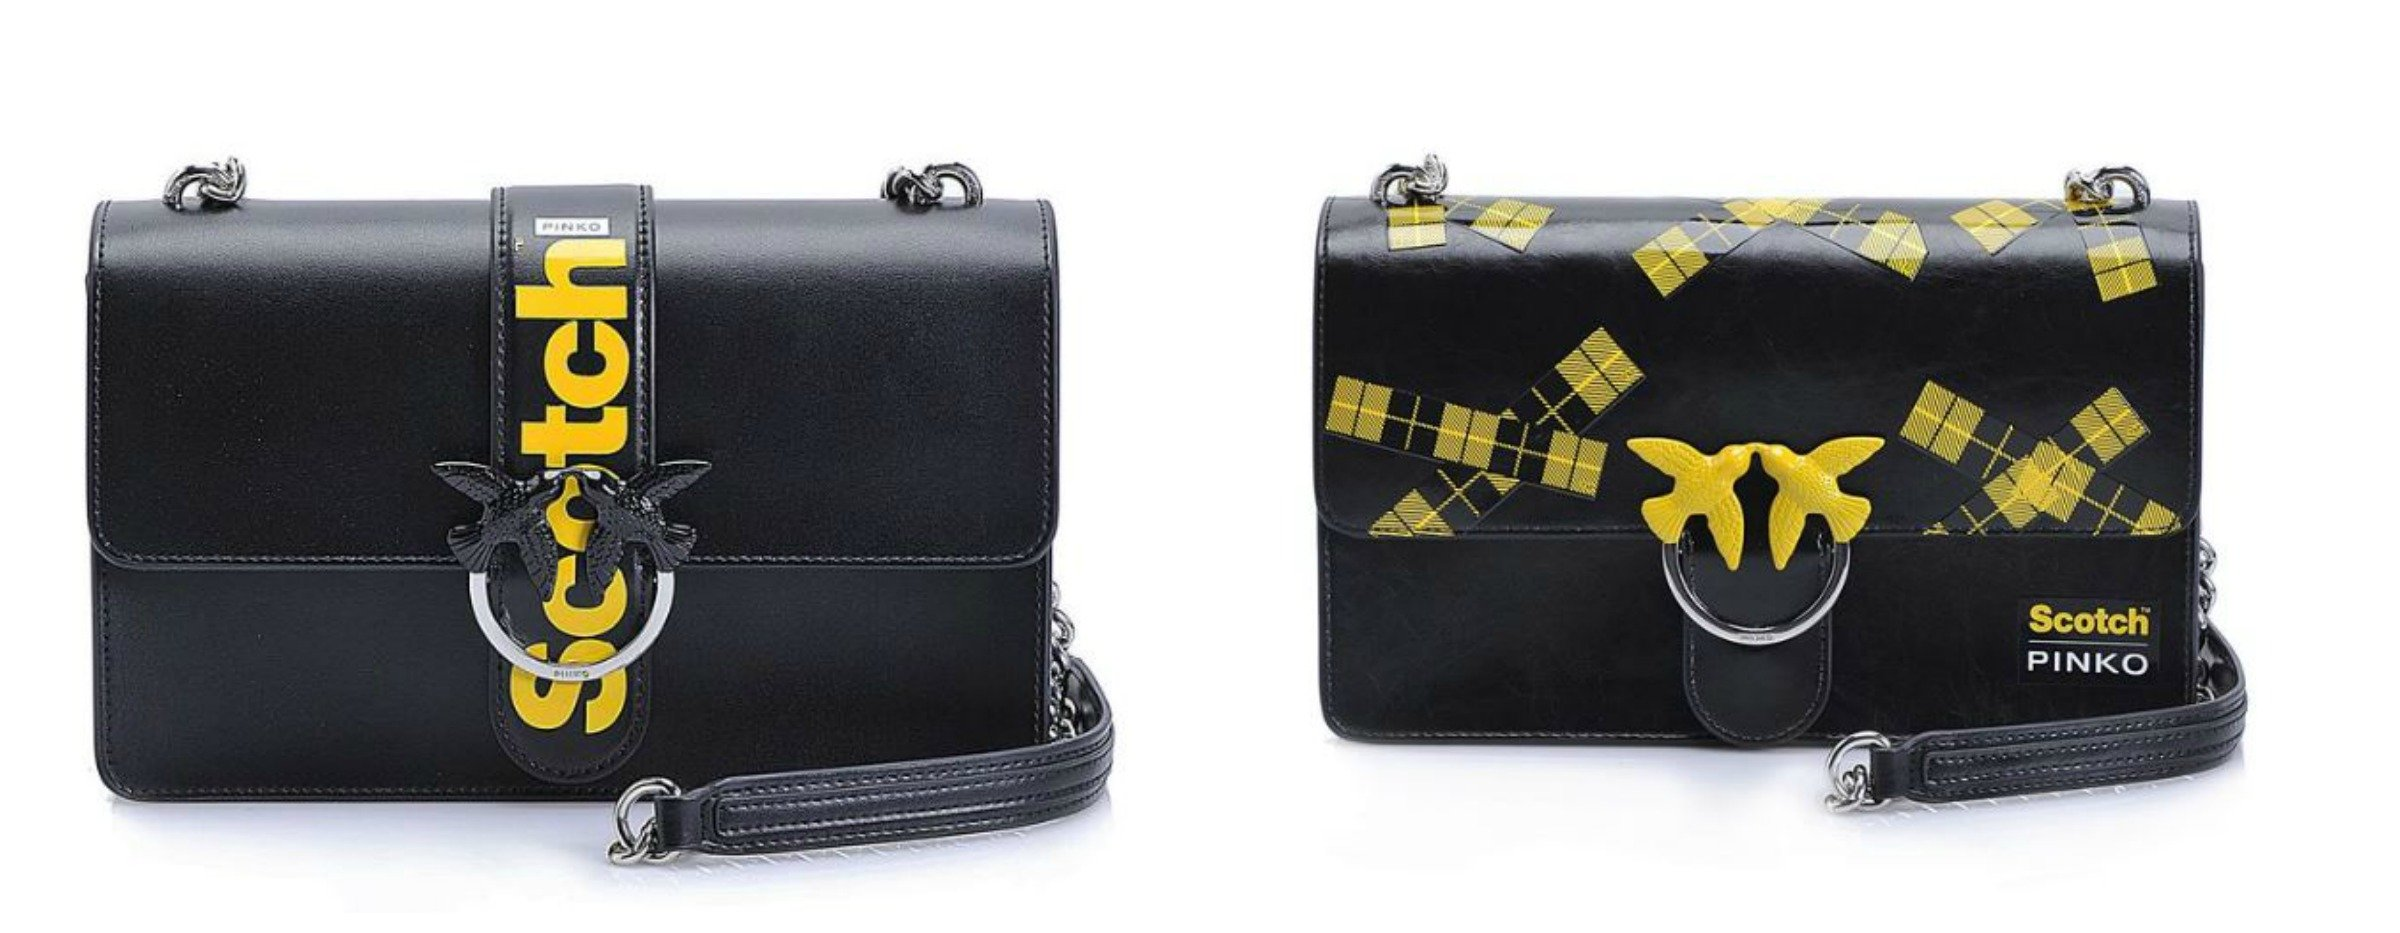 Nuova borsa Pinko Love Bag Scotch 2019